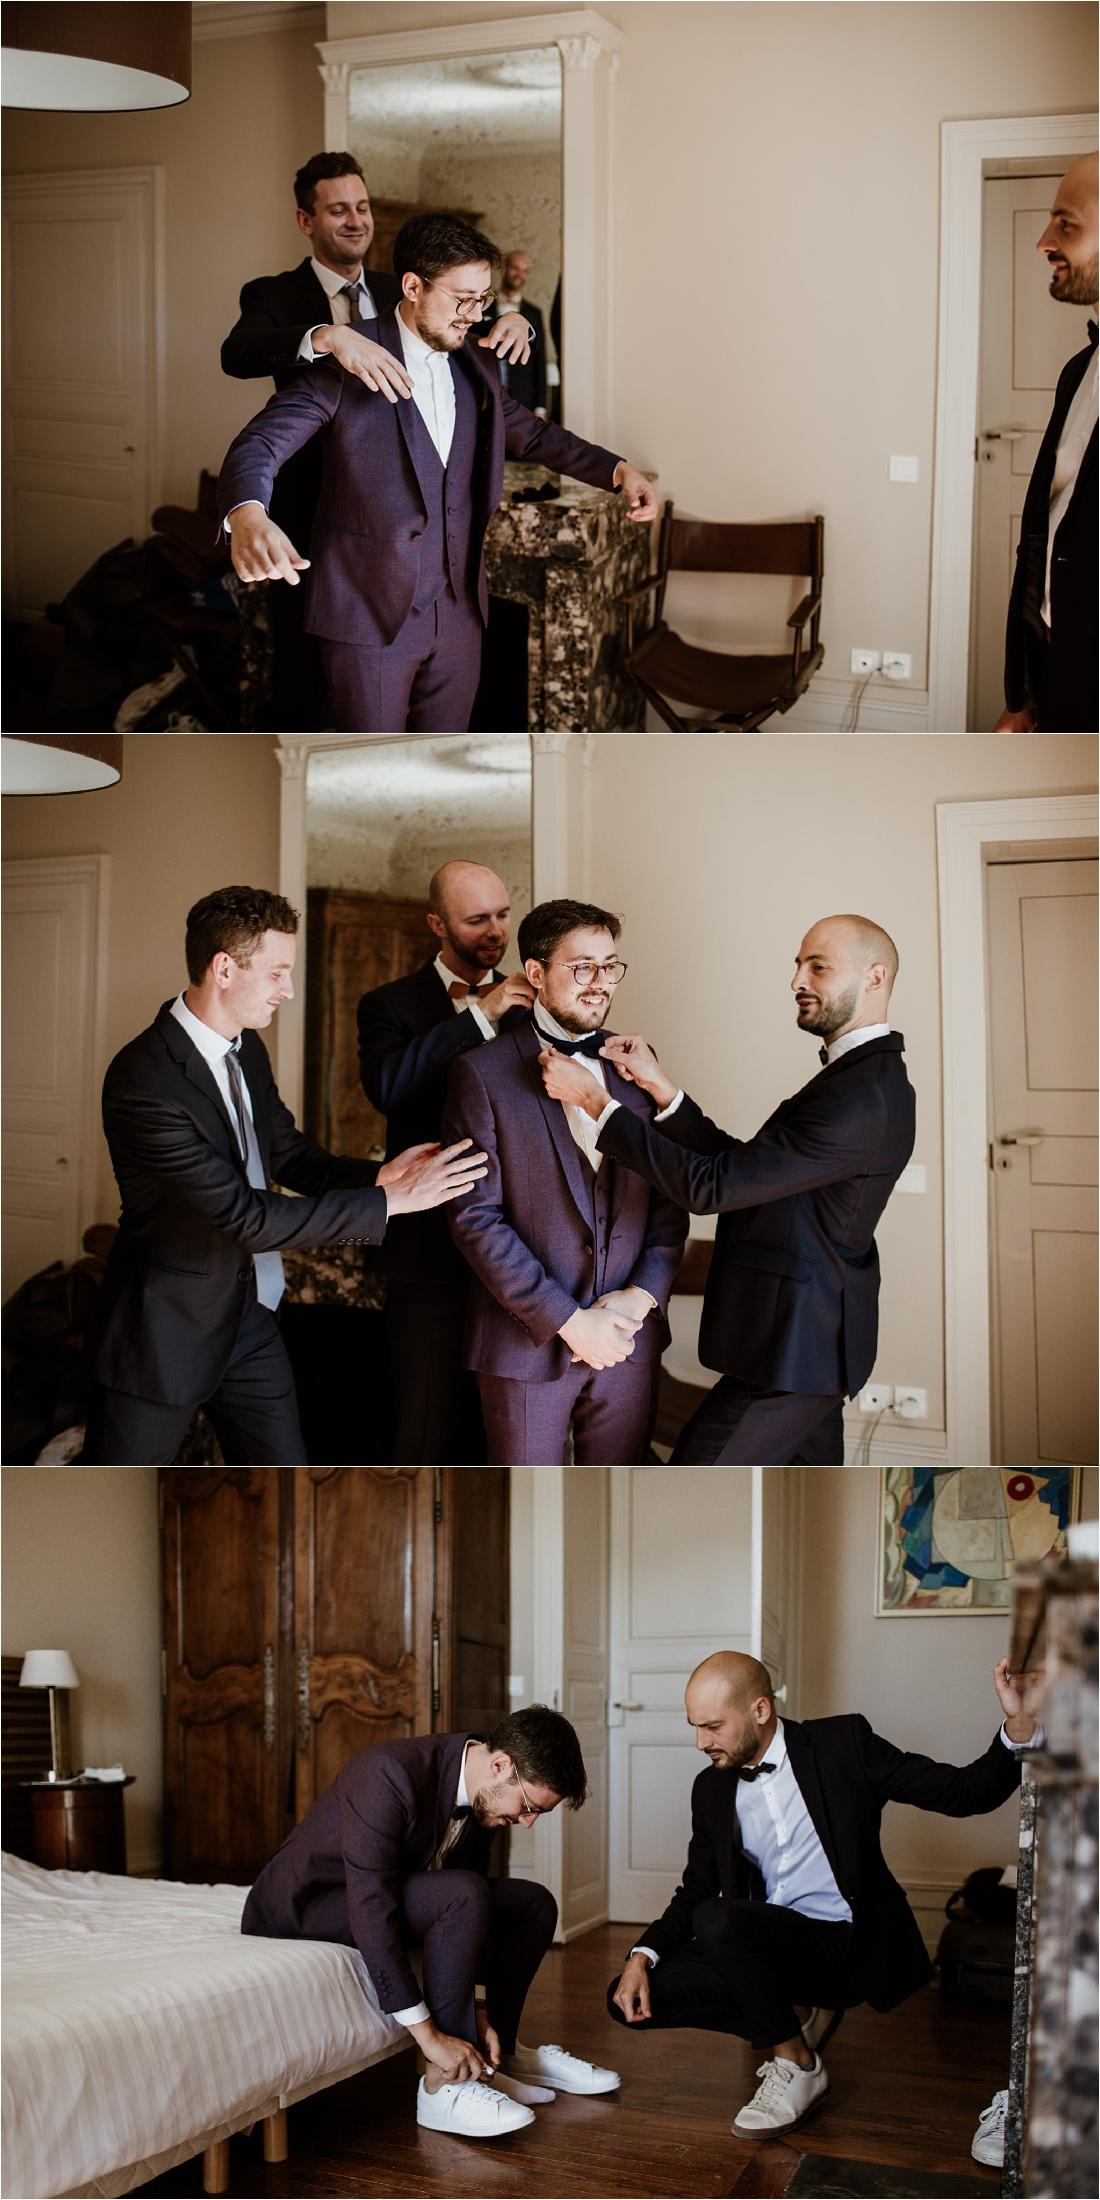 Photographe mariage Lyon Beaujolais